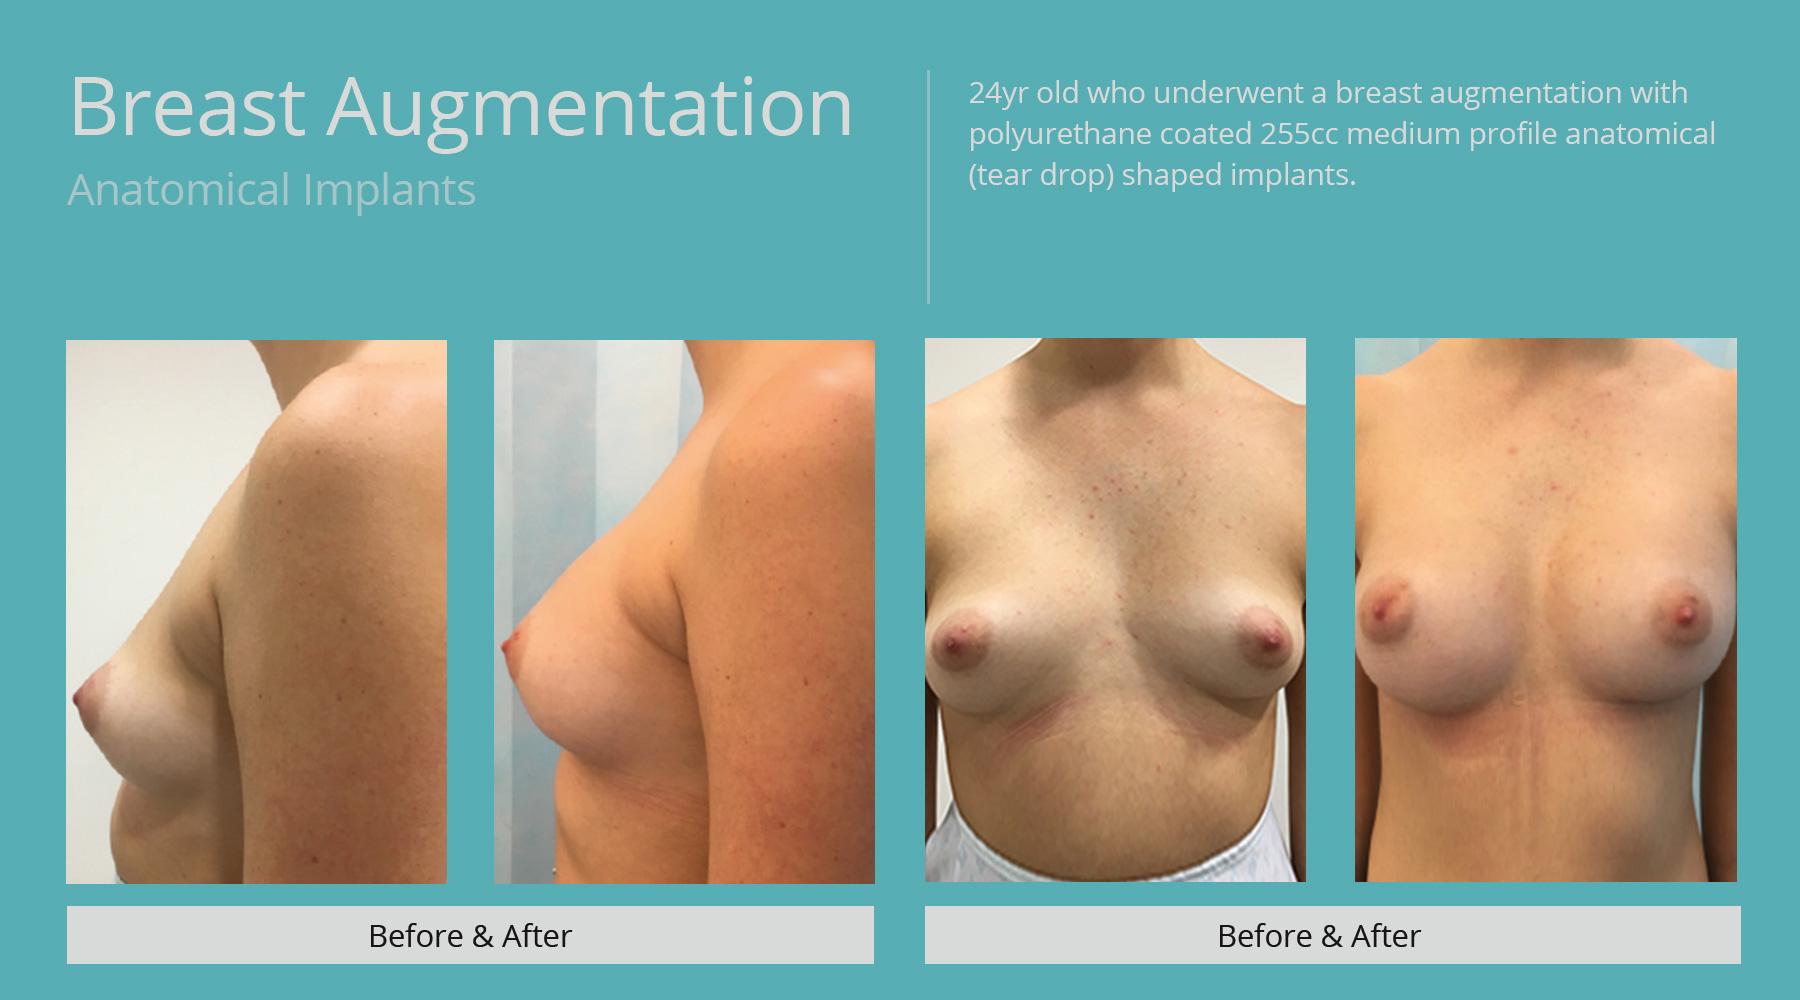 Breast-Augmentation-anatomical-6